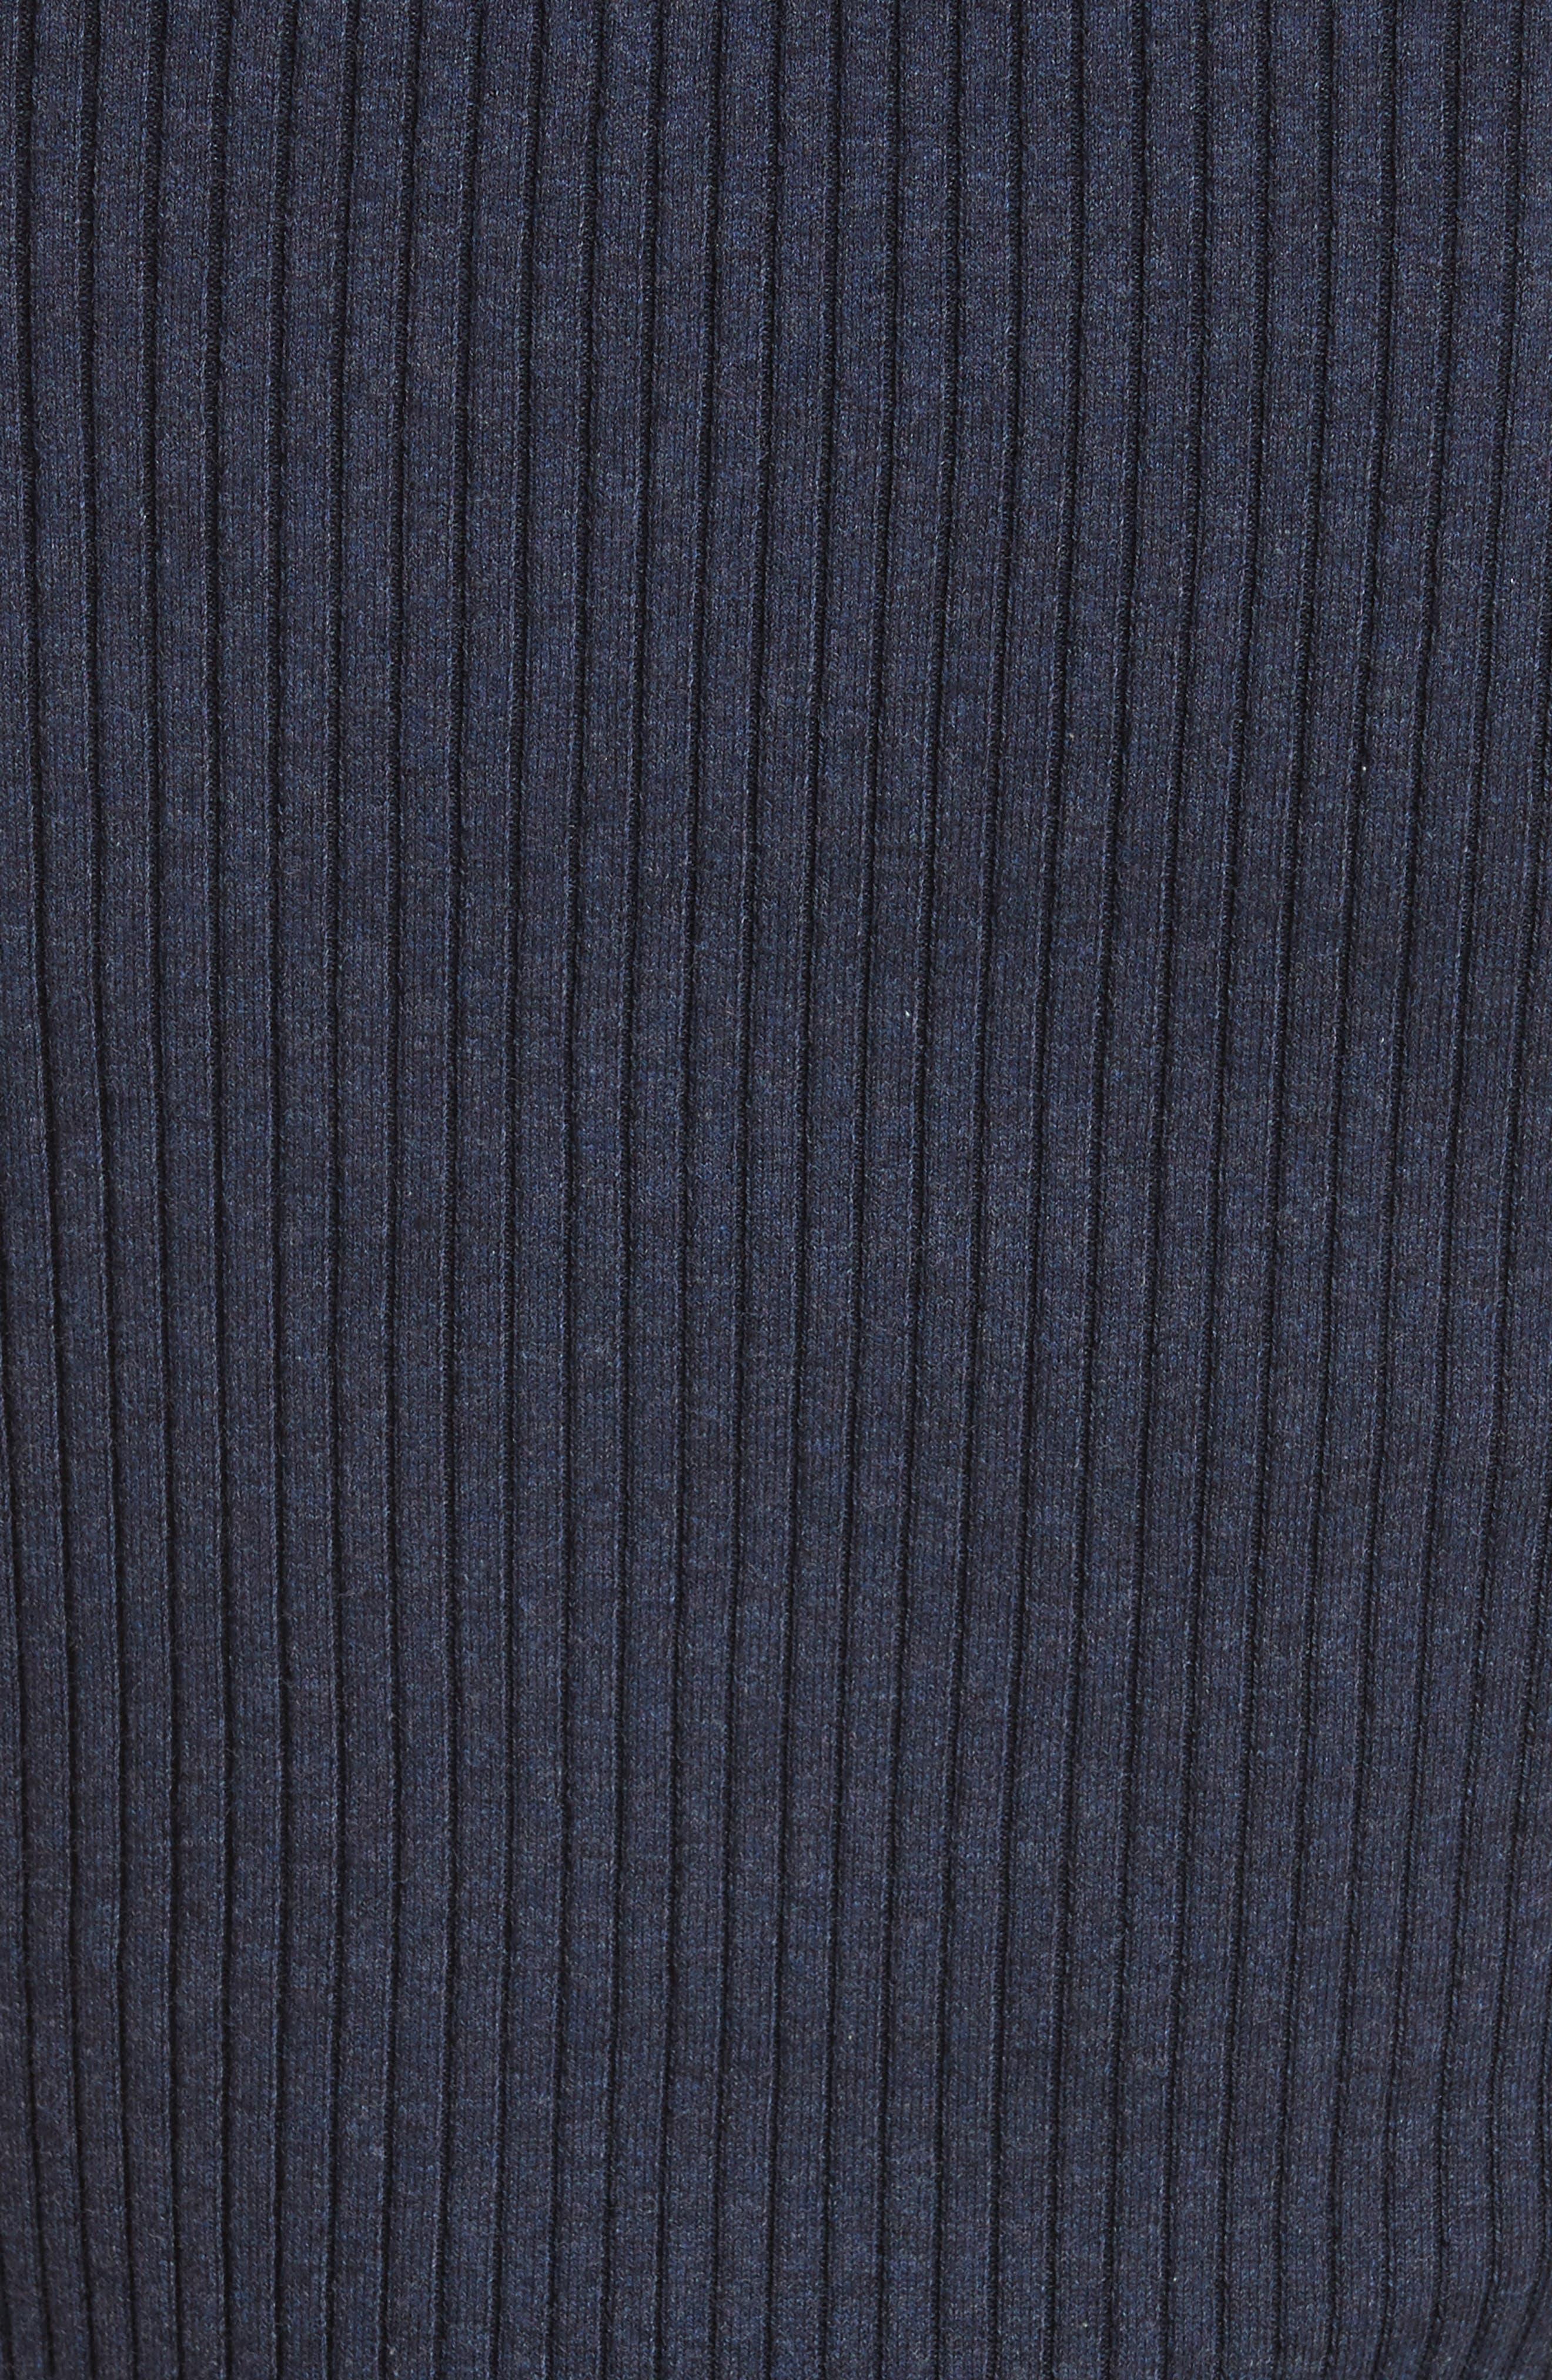 Knit Top,                             Alternate thumbnail 5, color,                             400